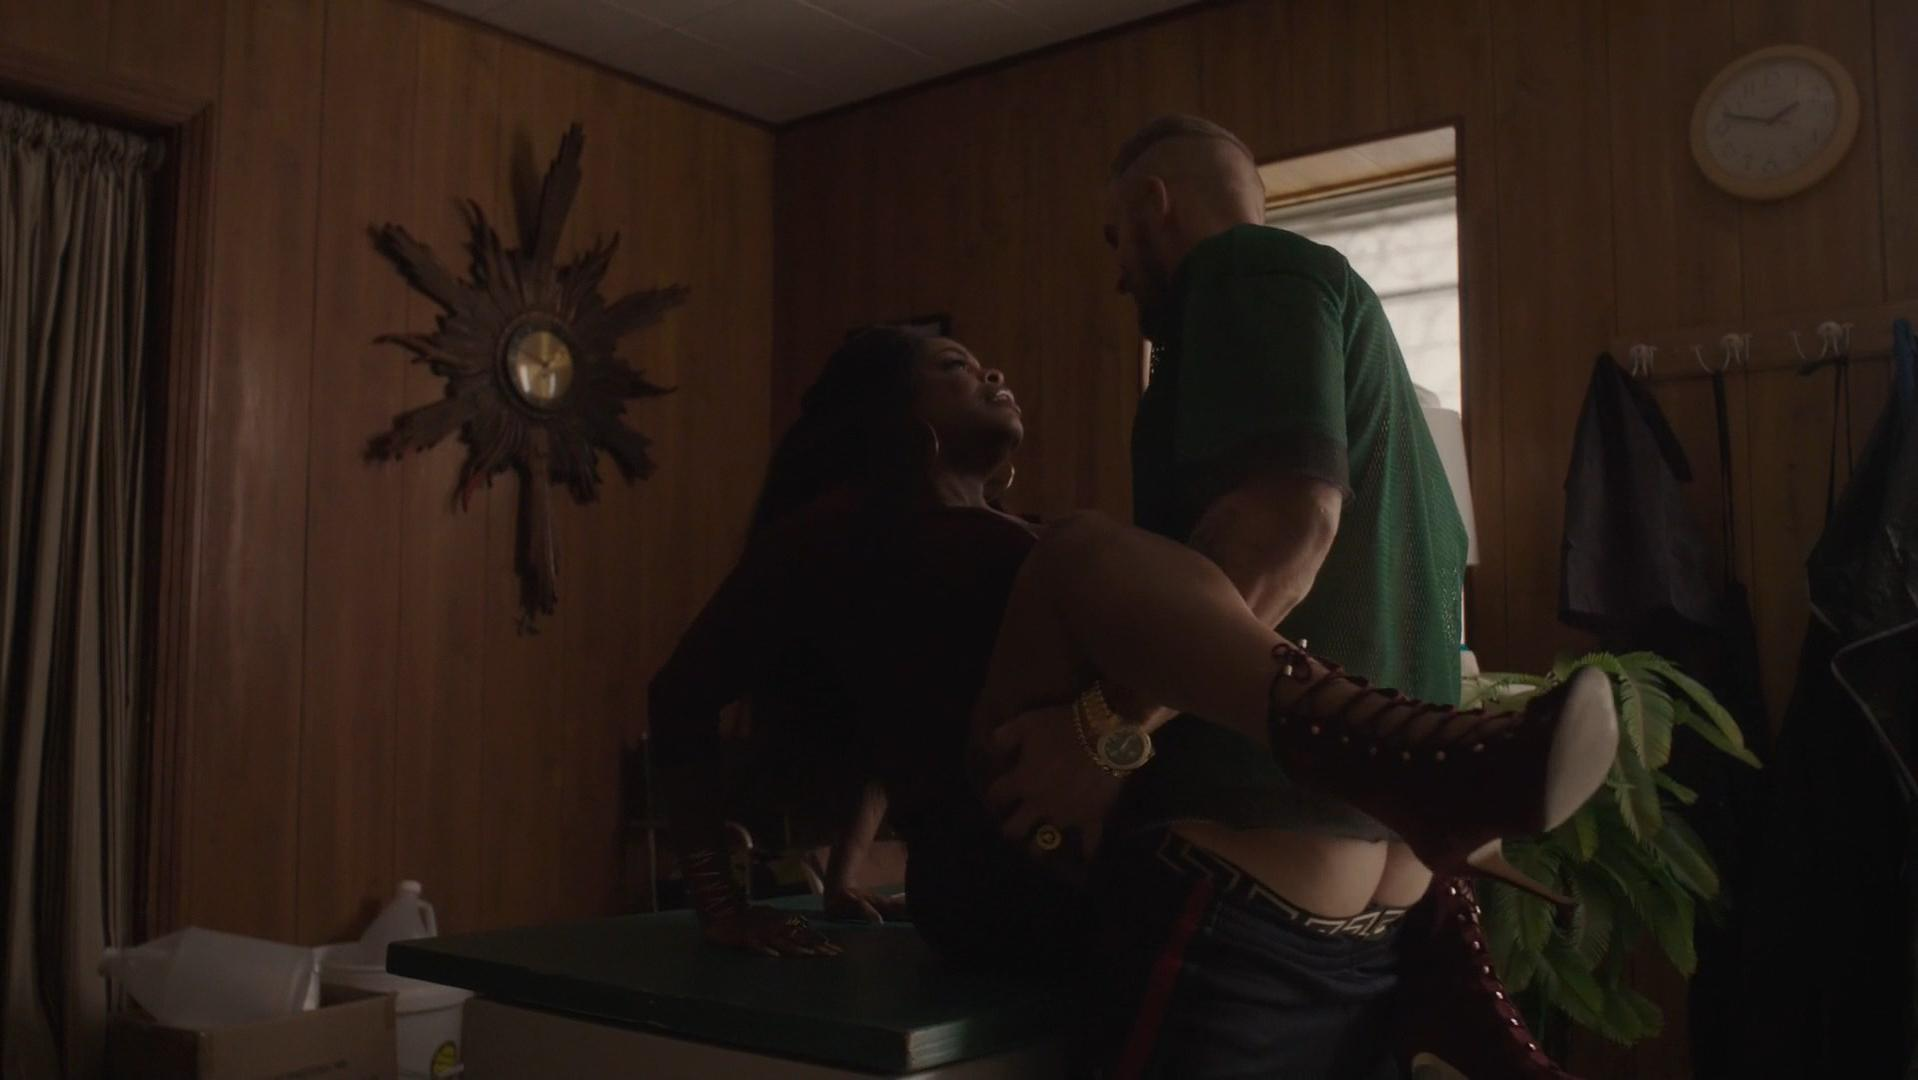 Karrueche tran sex scene in claws series scandalplanetcom 7